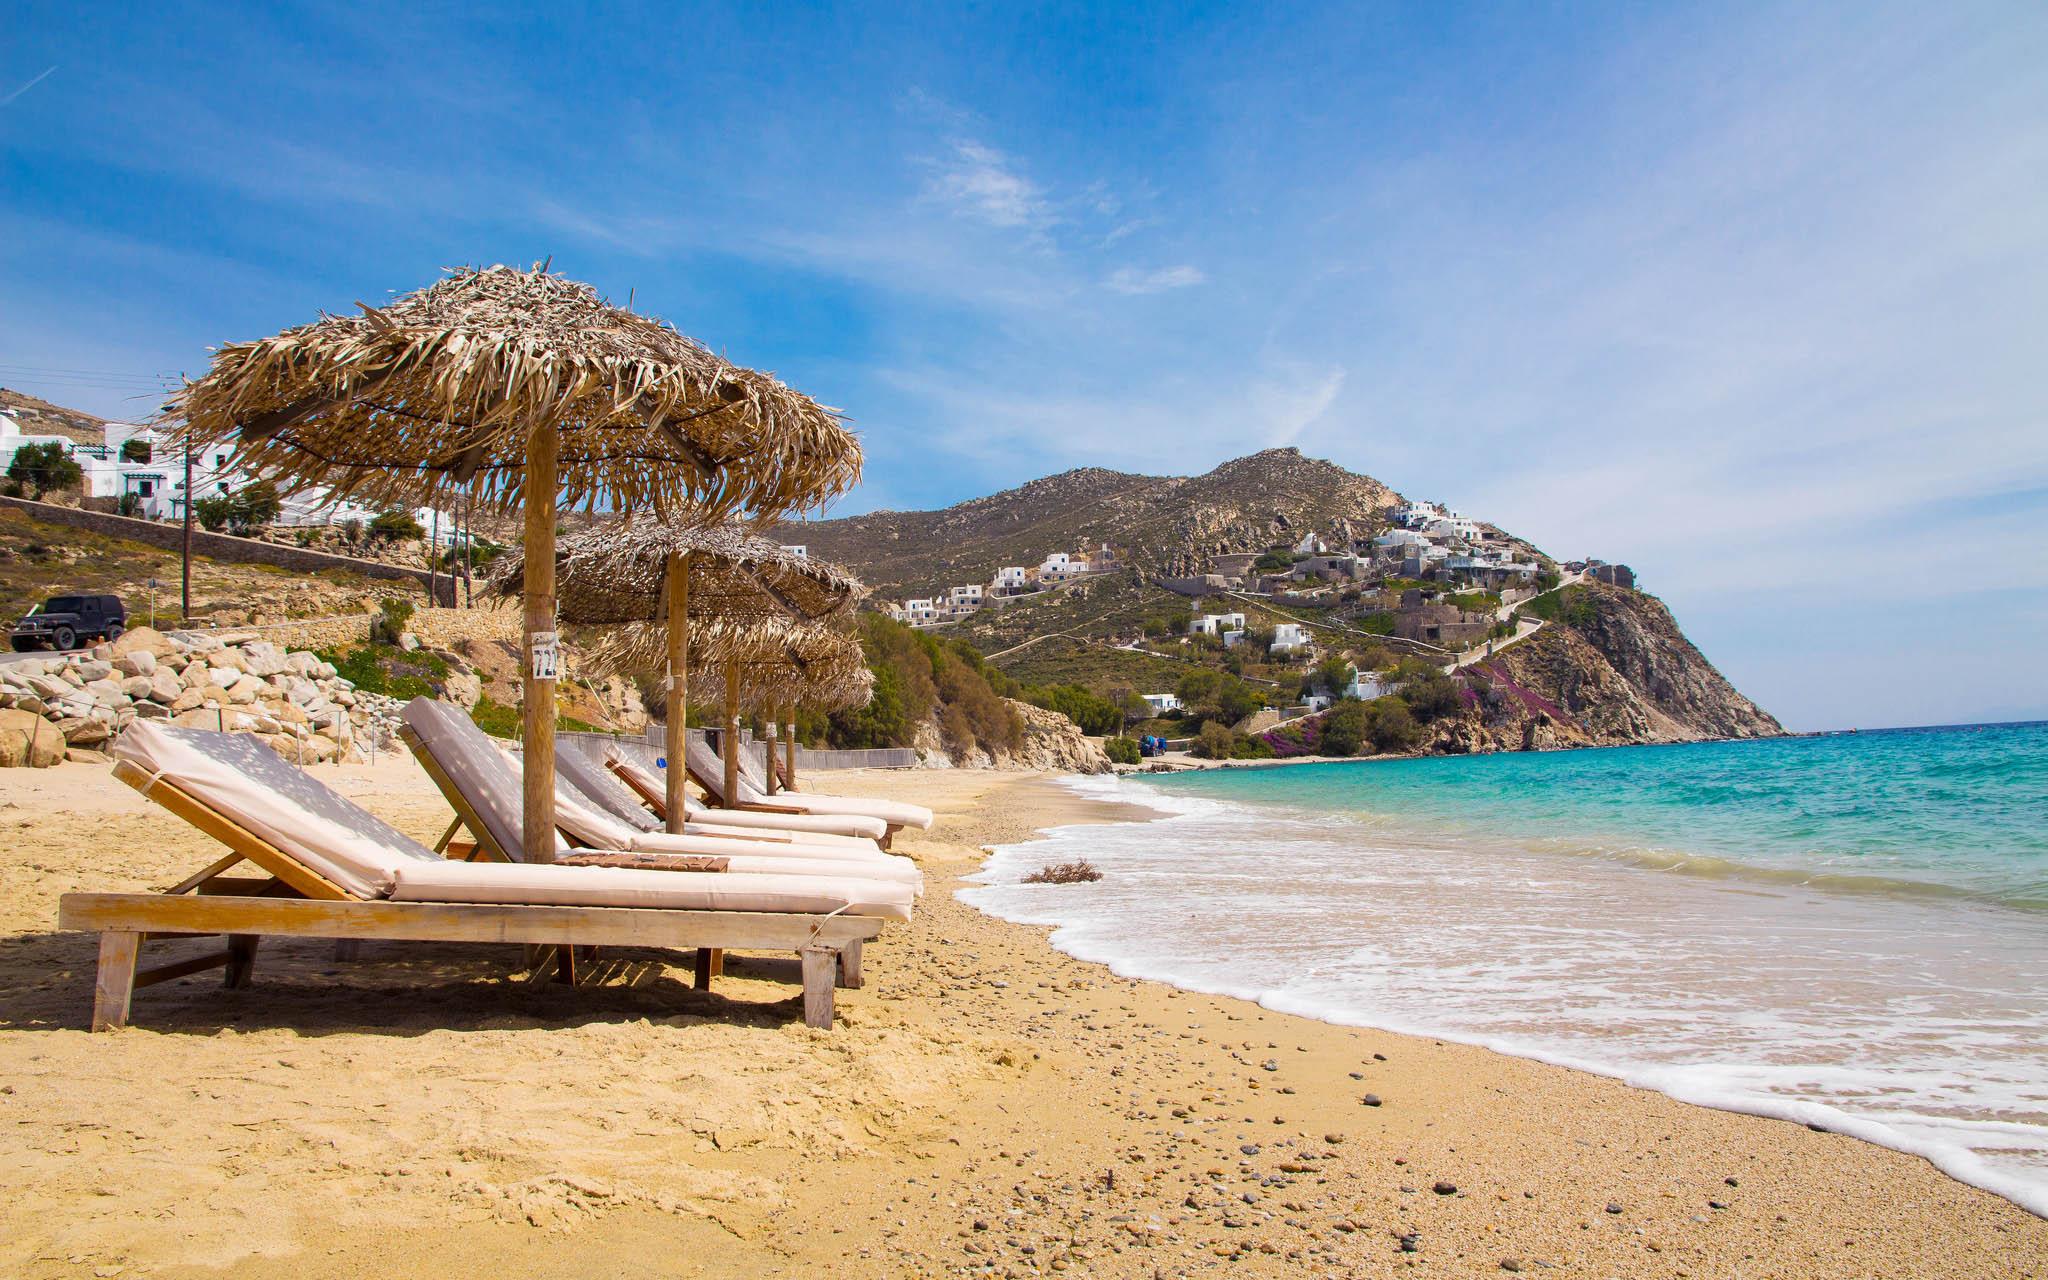 Elia Beach on Mykonos, Greece.